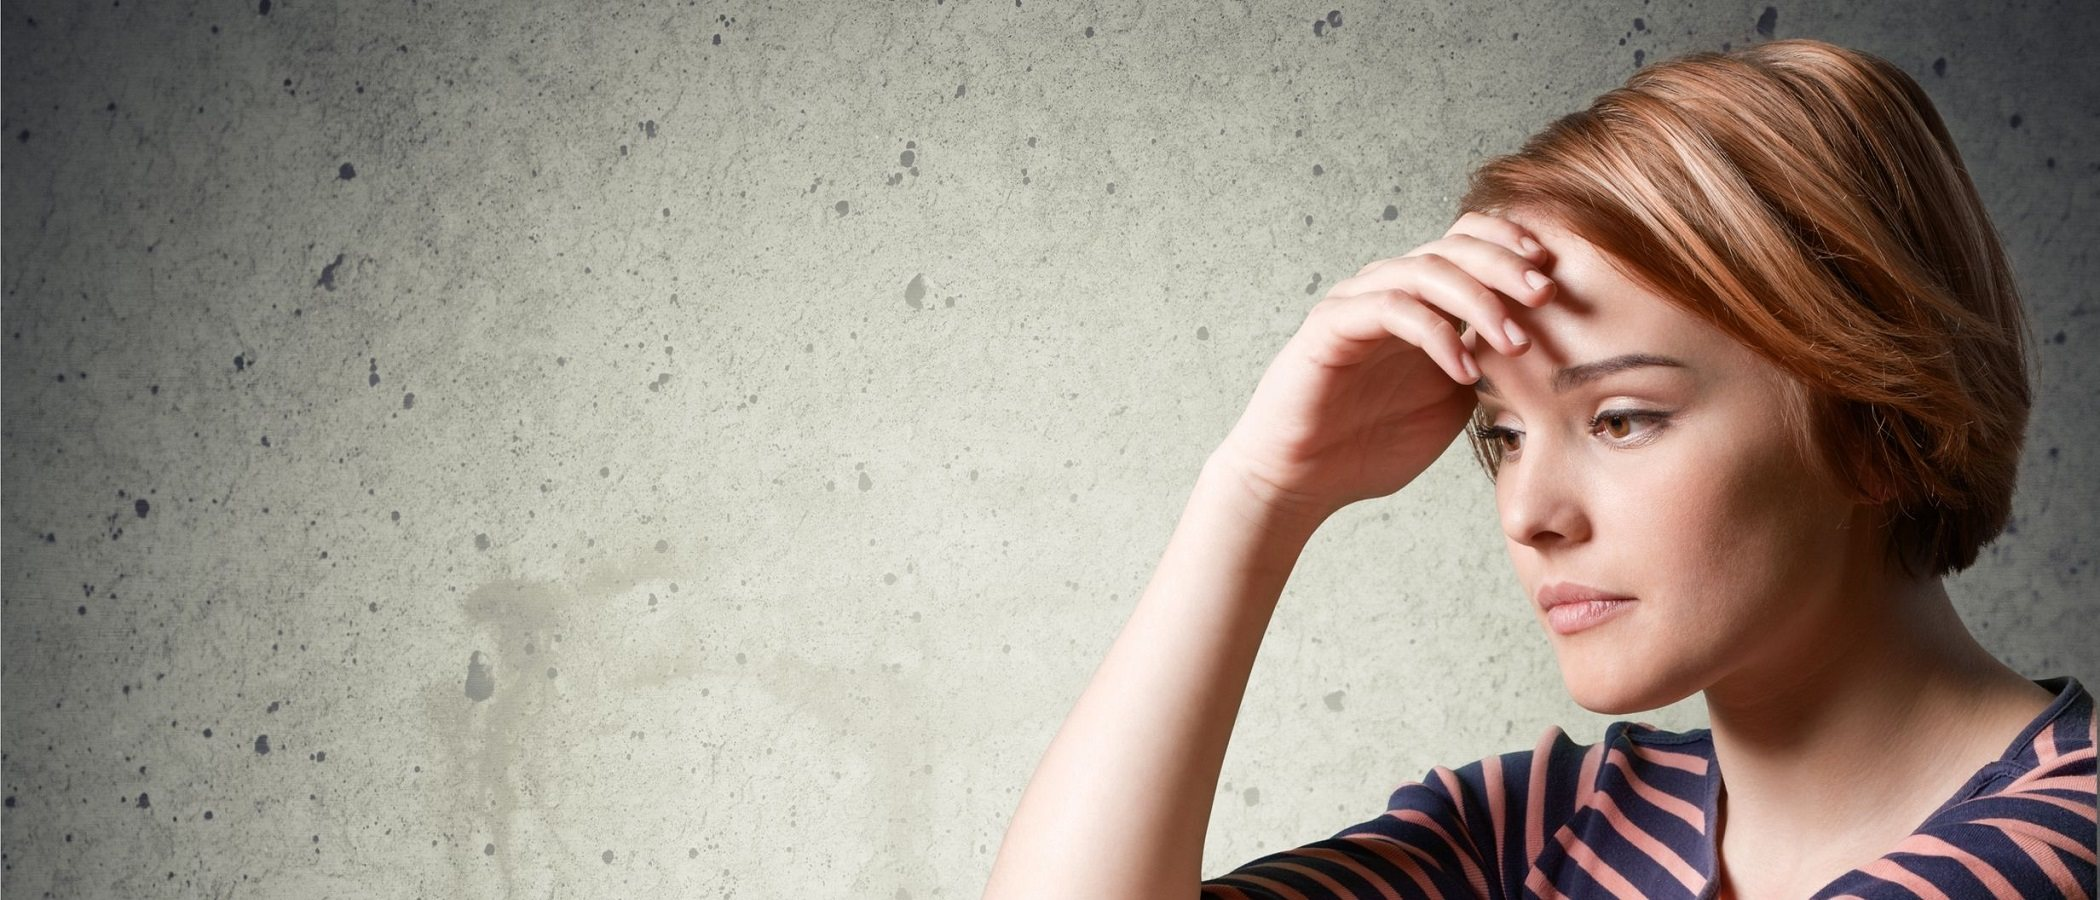 7 características de un adolescente con depresión